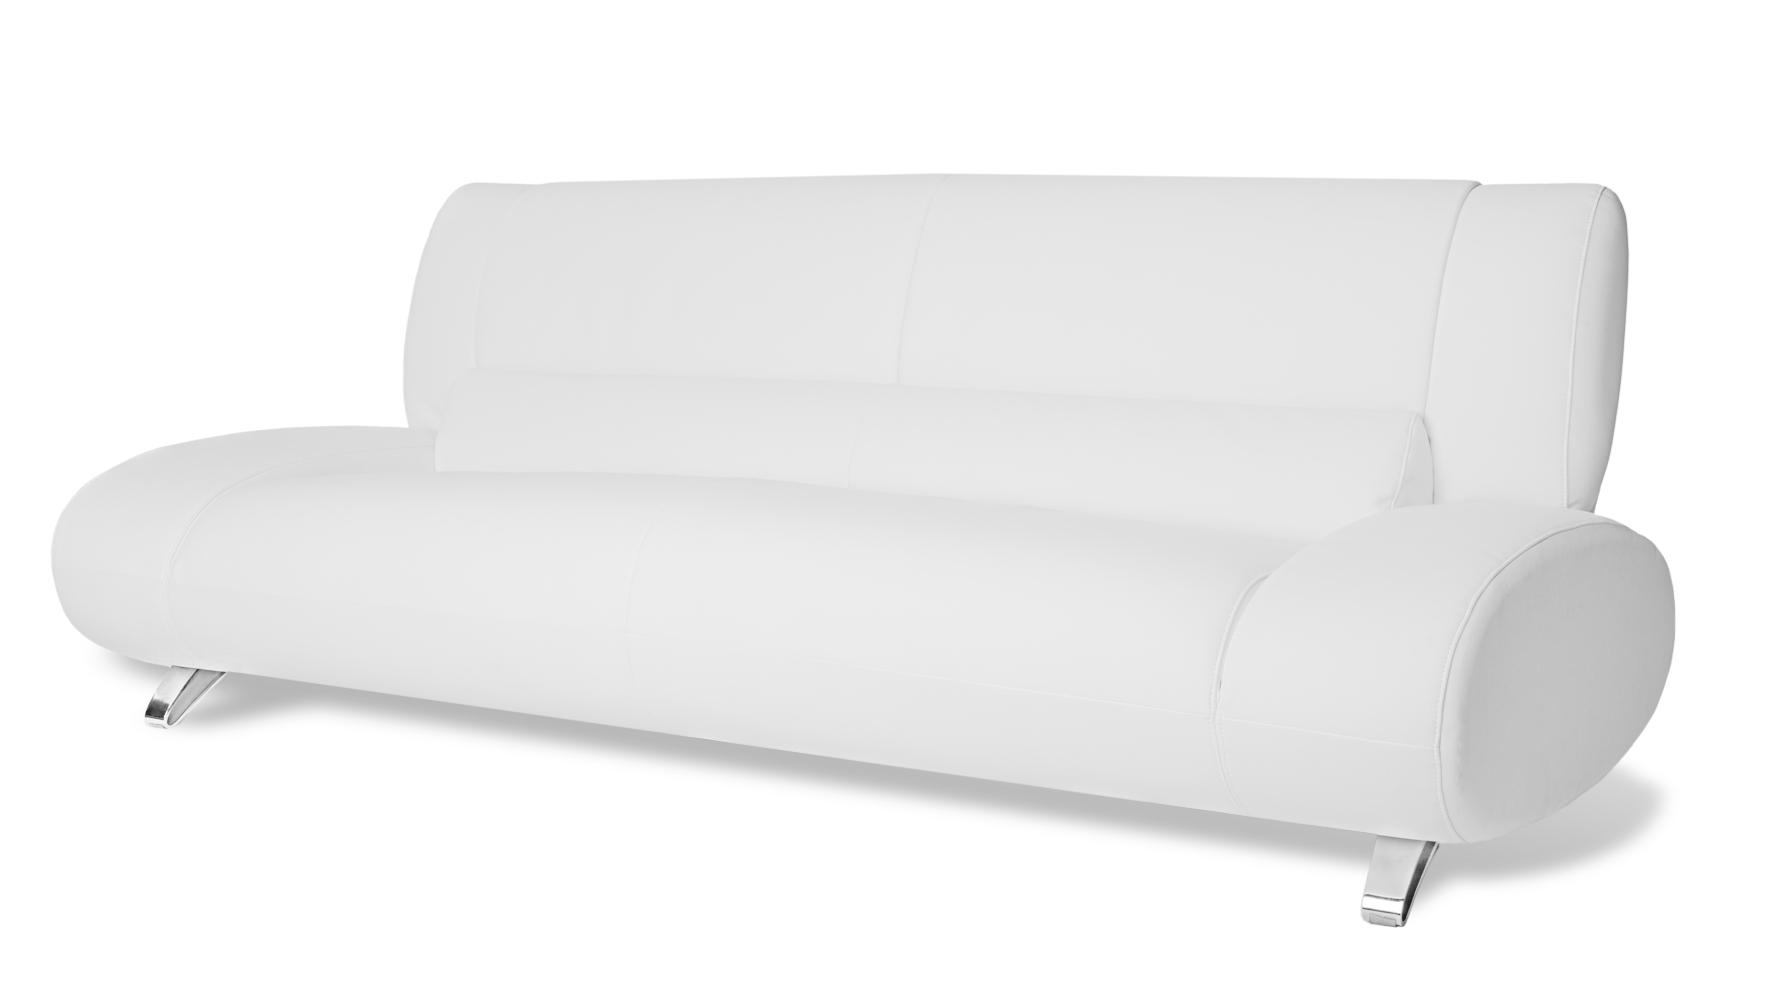 aspen convertible sectional storage sofa bed la z boy collins jonathan adler candelabra inc thesofa